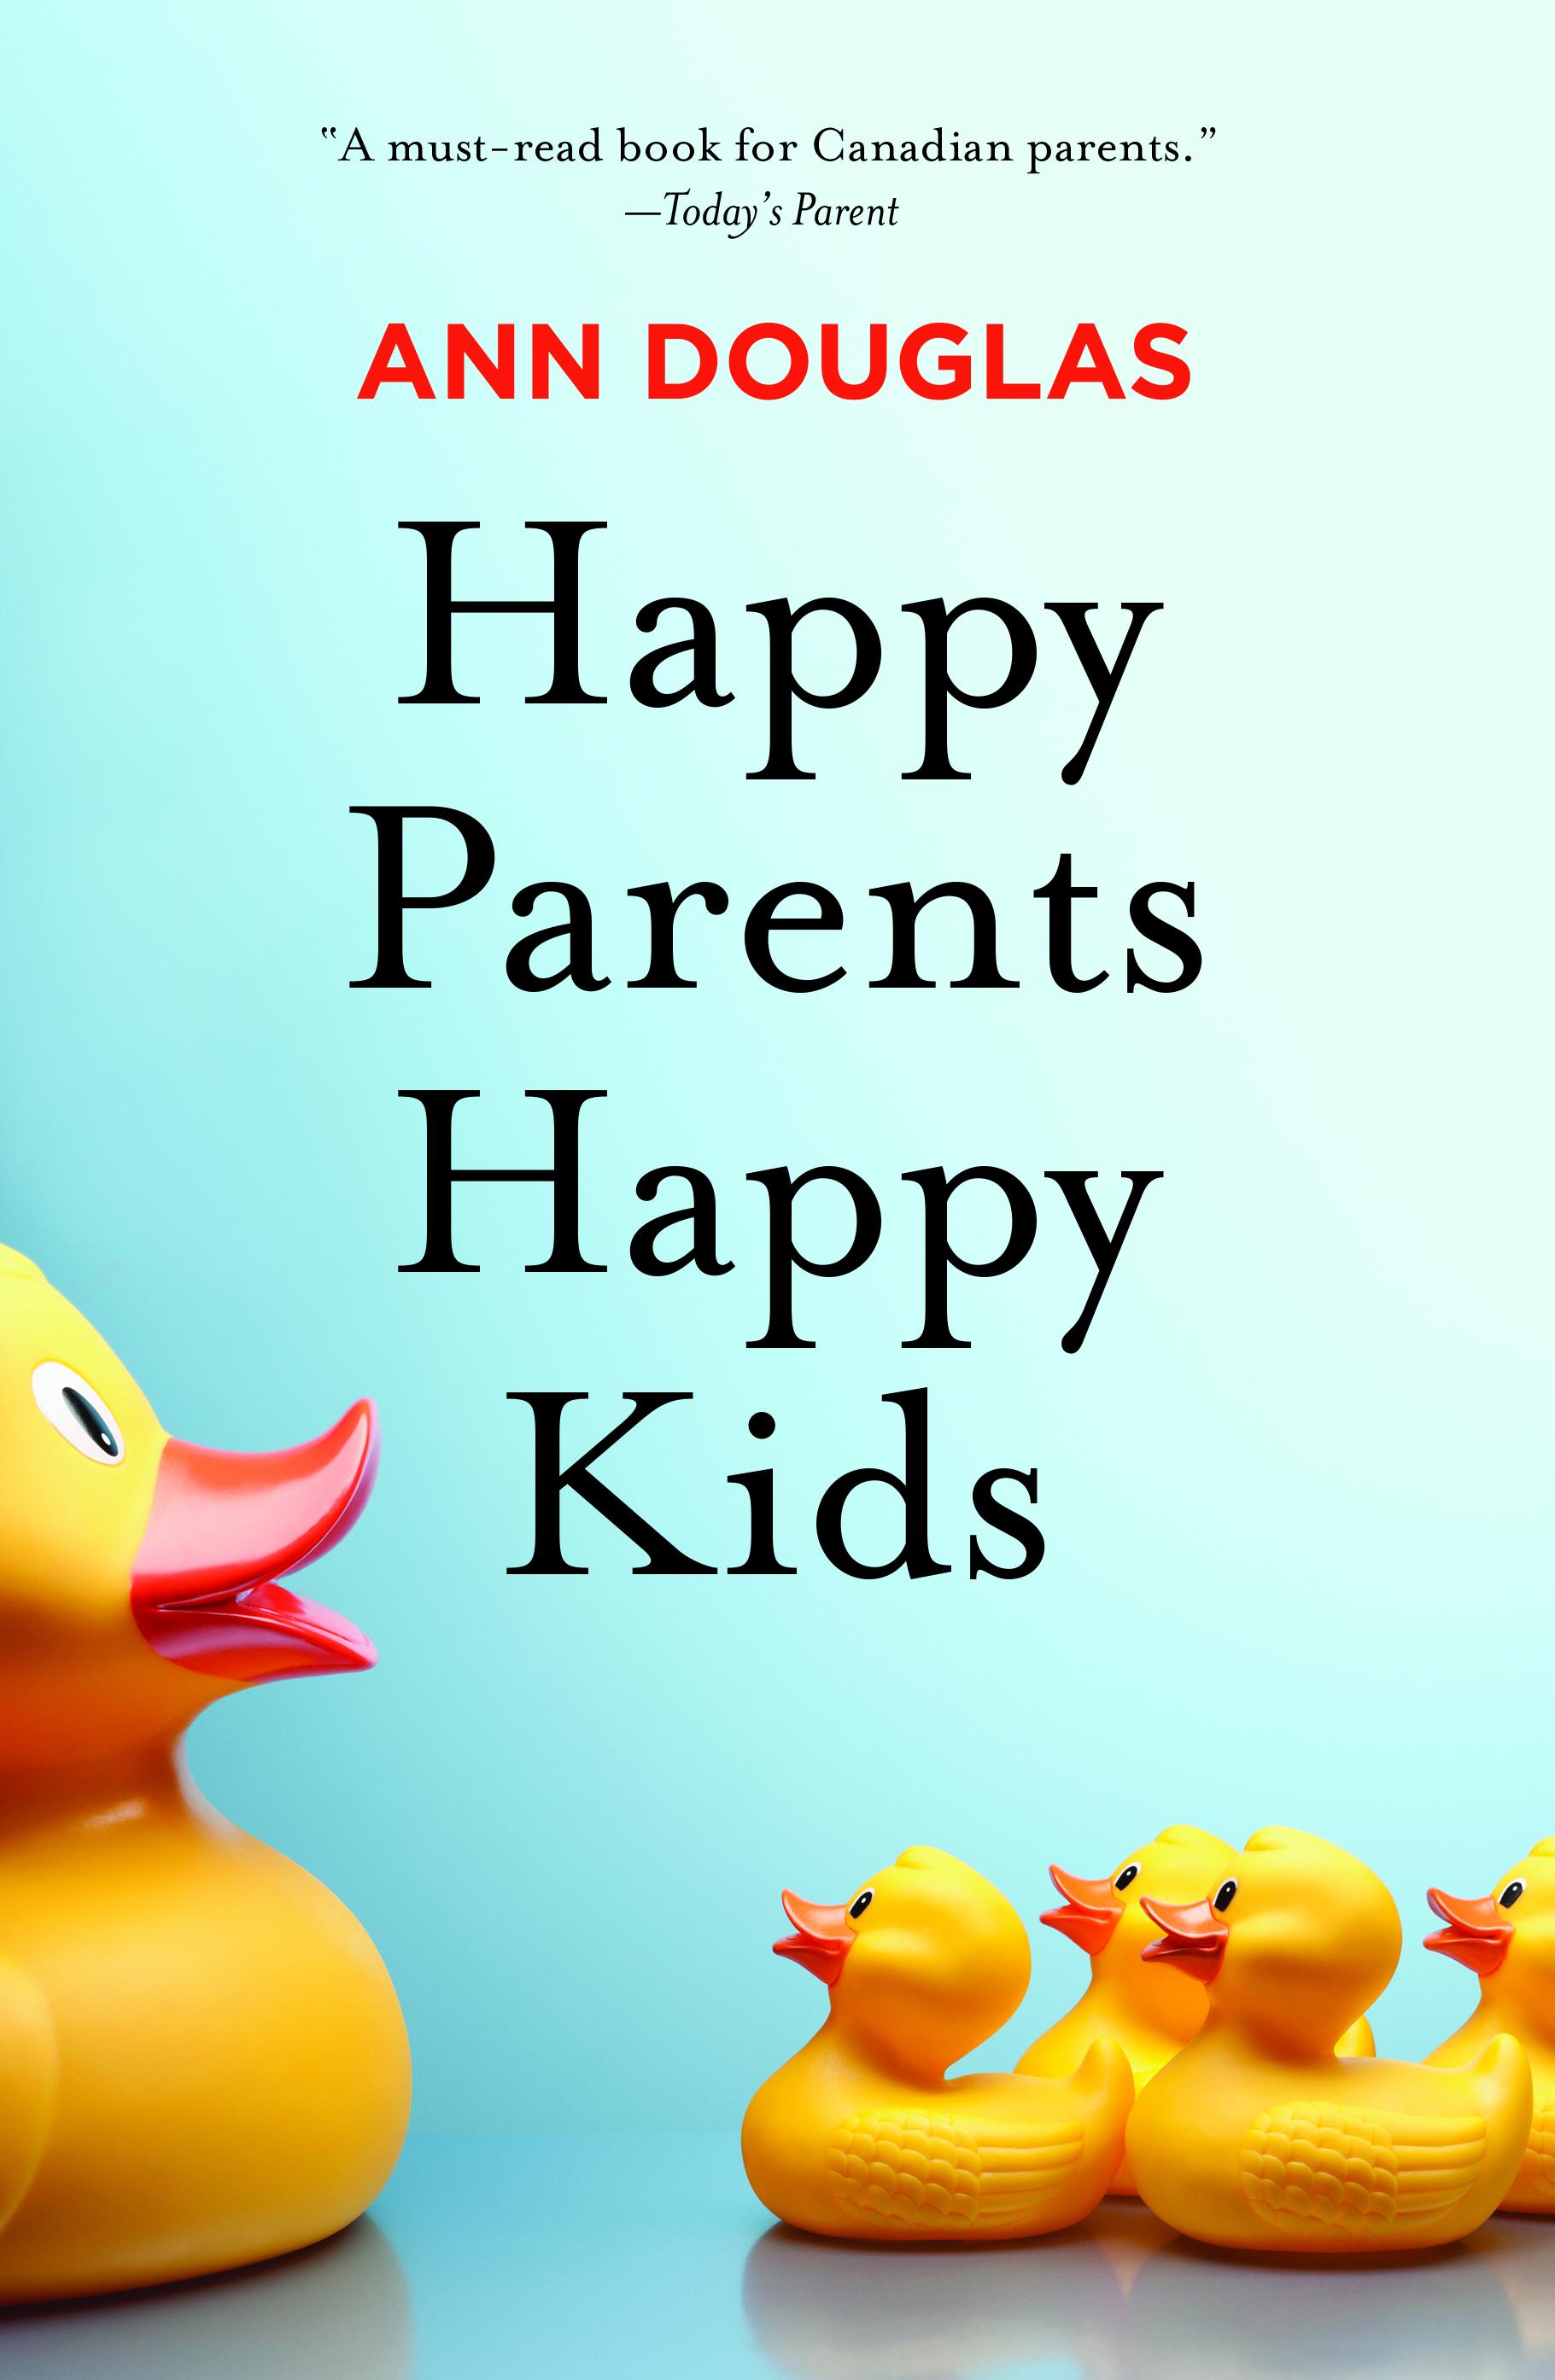 Happy Parents Happy Kids  by Ann Douglas (HarperCollins Canada, 2019).